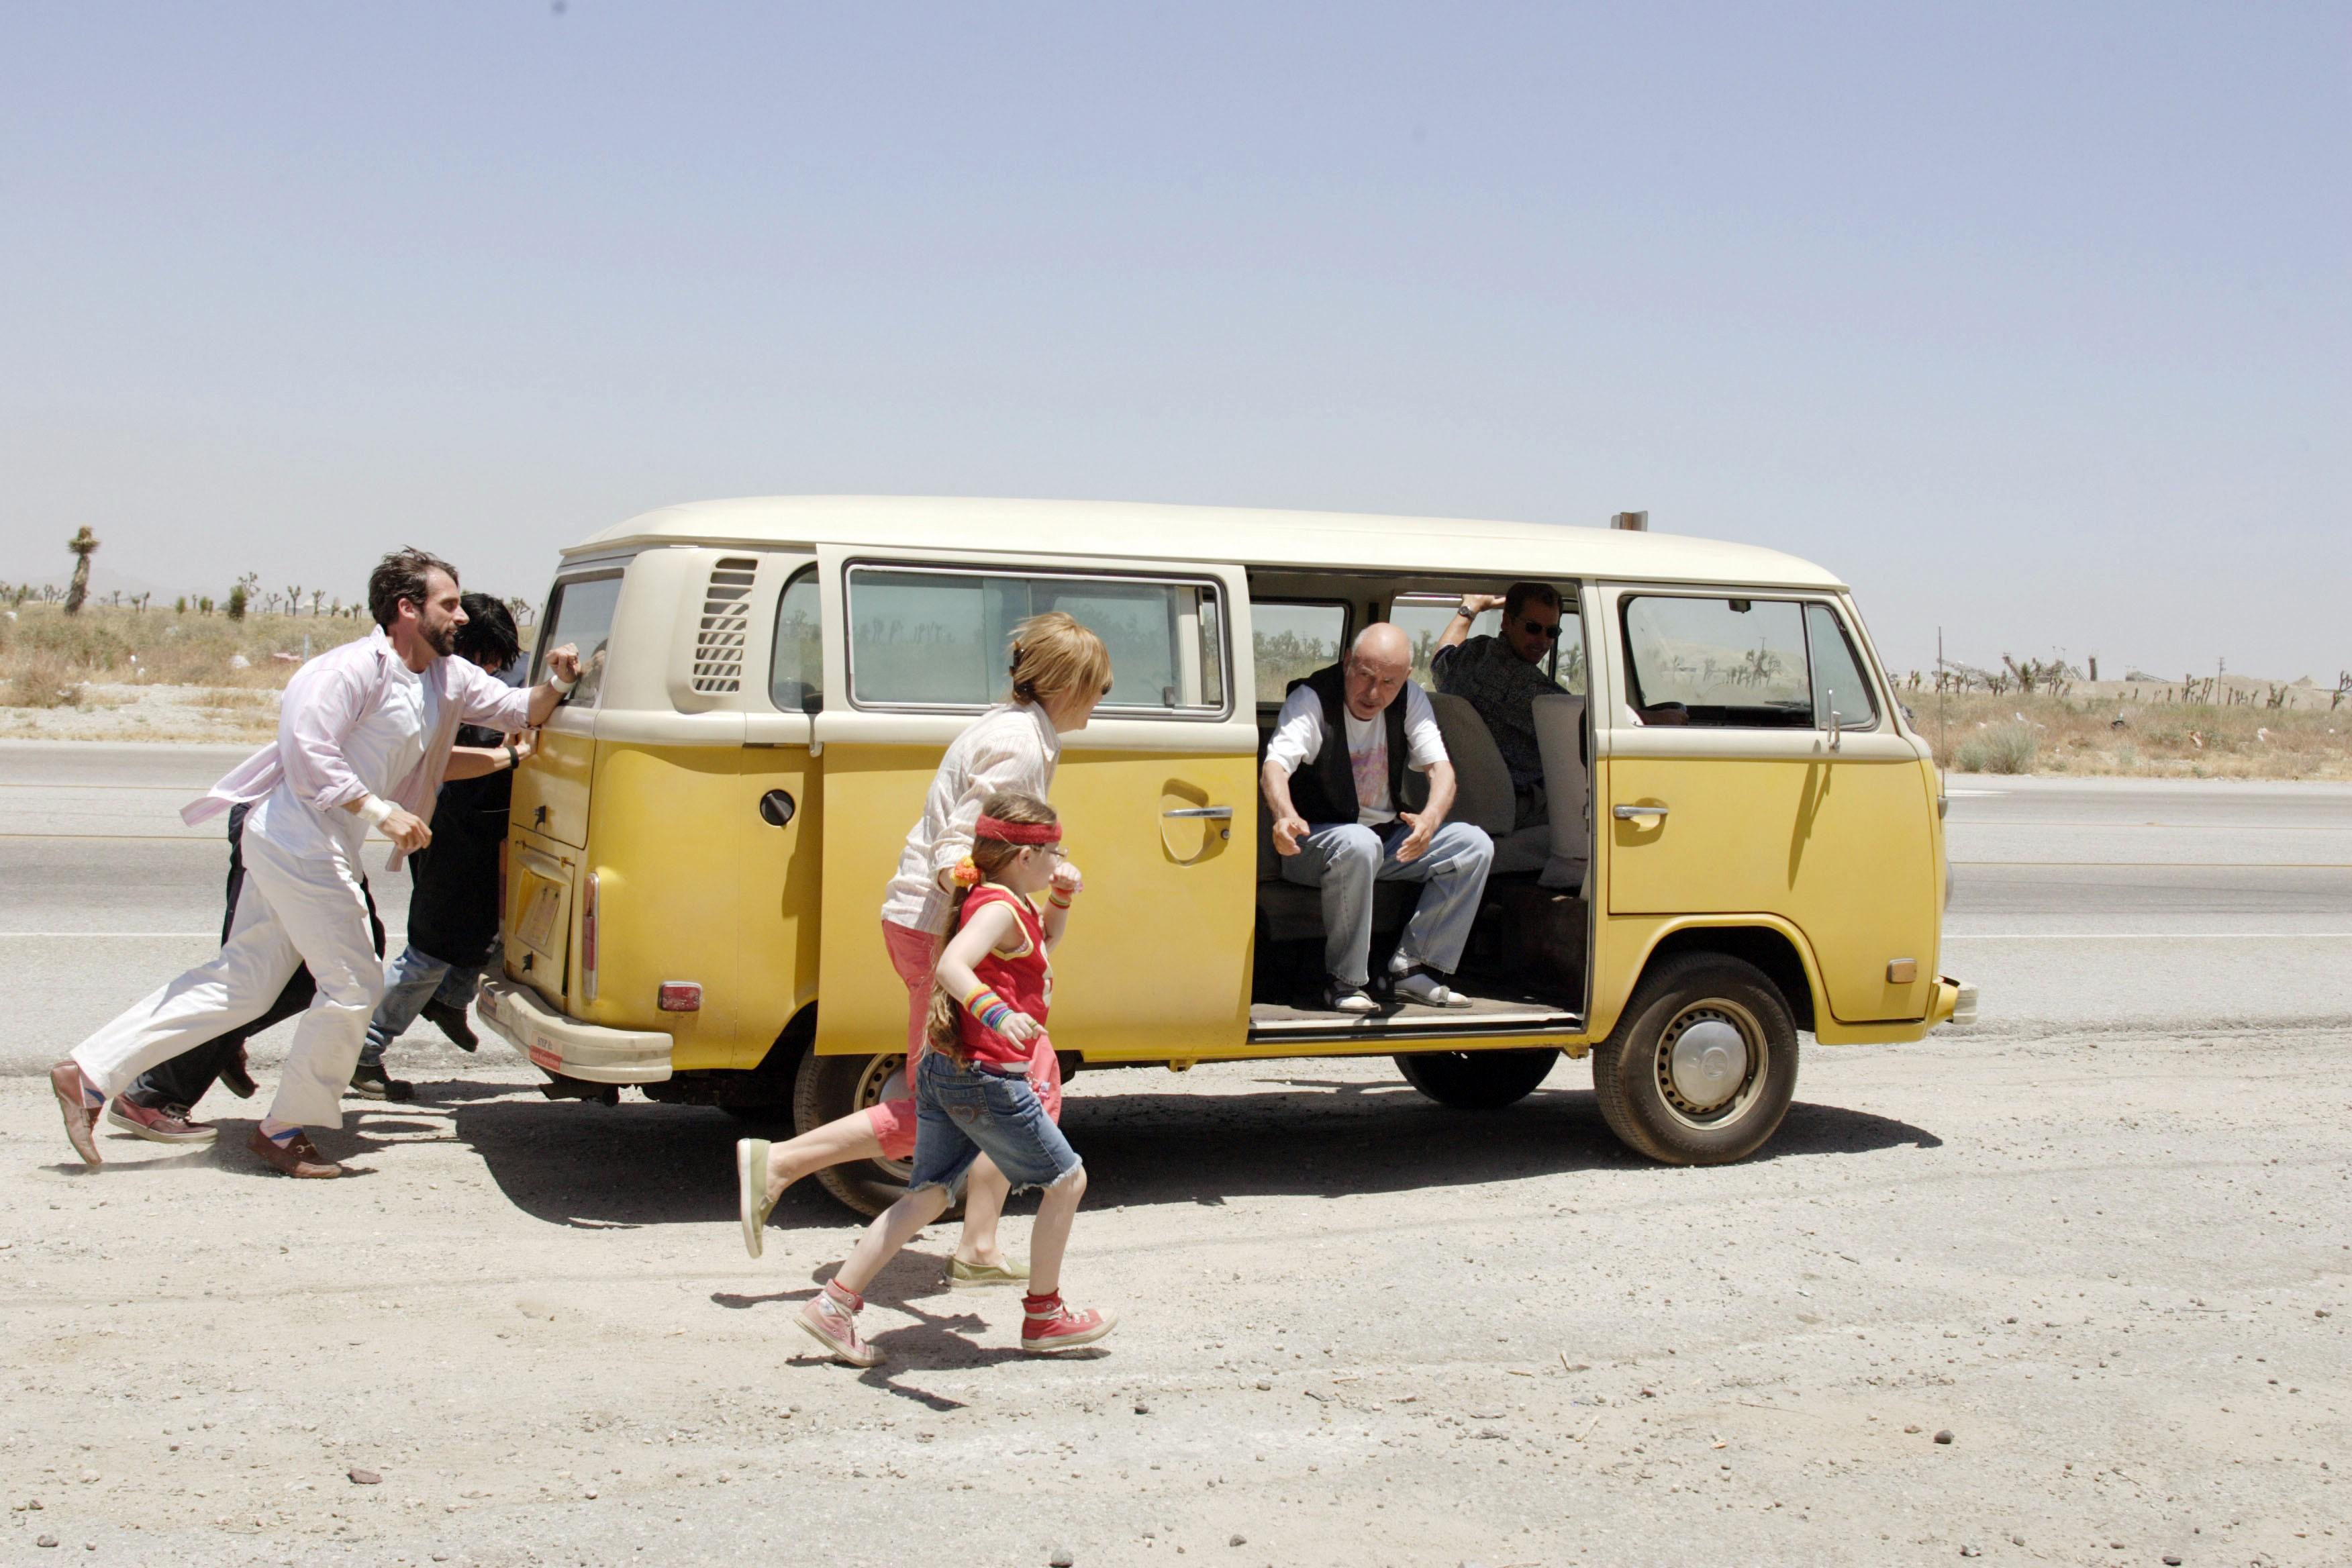 I migliori film sui viaggi da vedere assolutamente